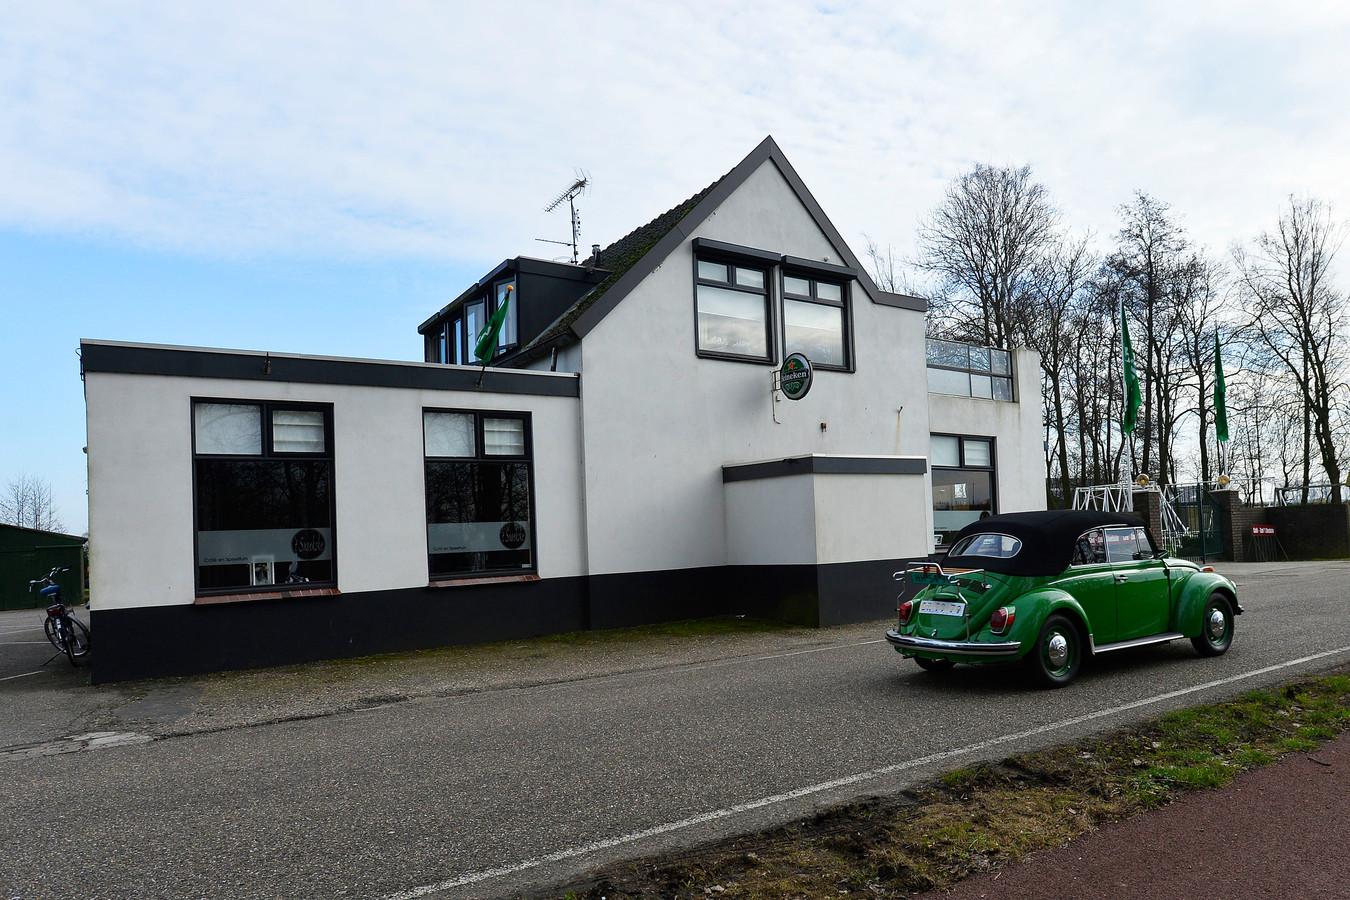 Café t Snoekske aan de Valkenvoortweg.